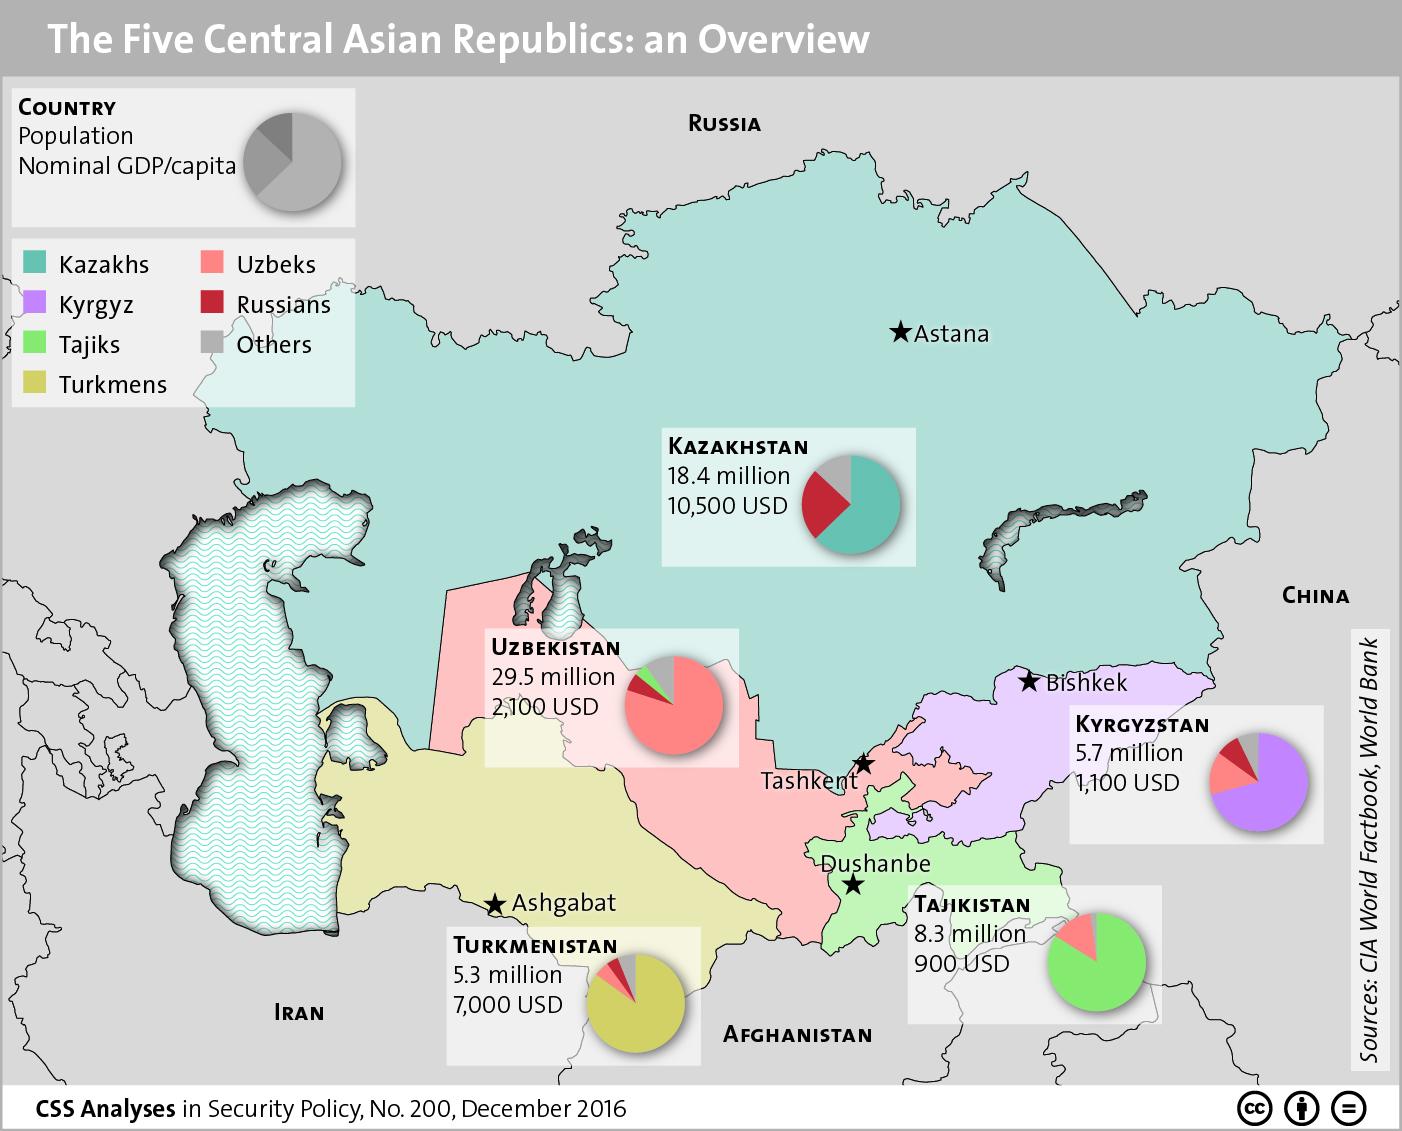 Five Central Asian Republics